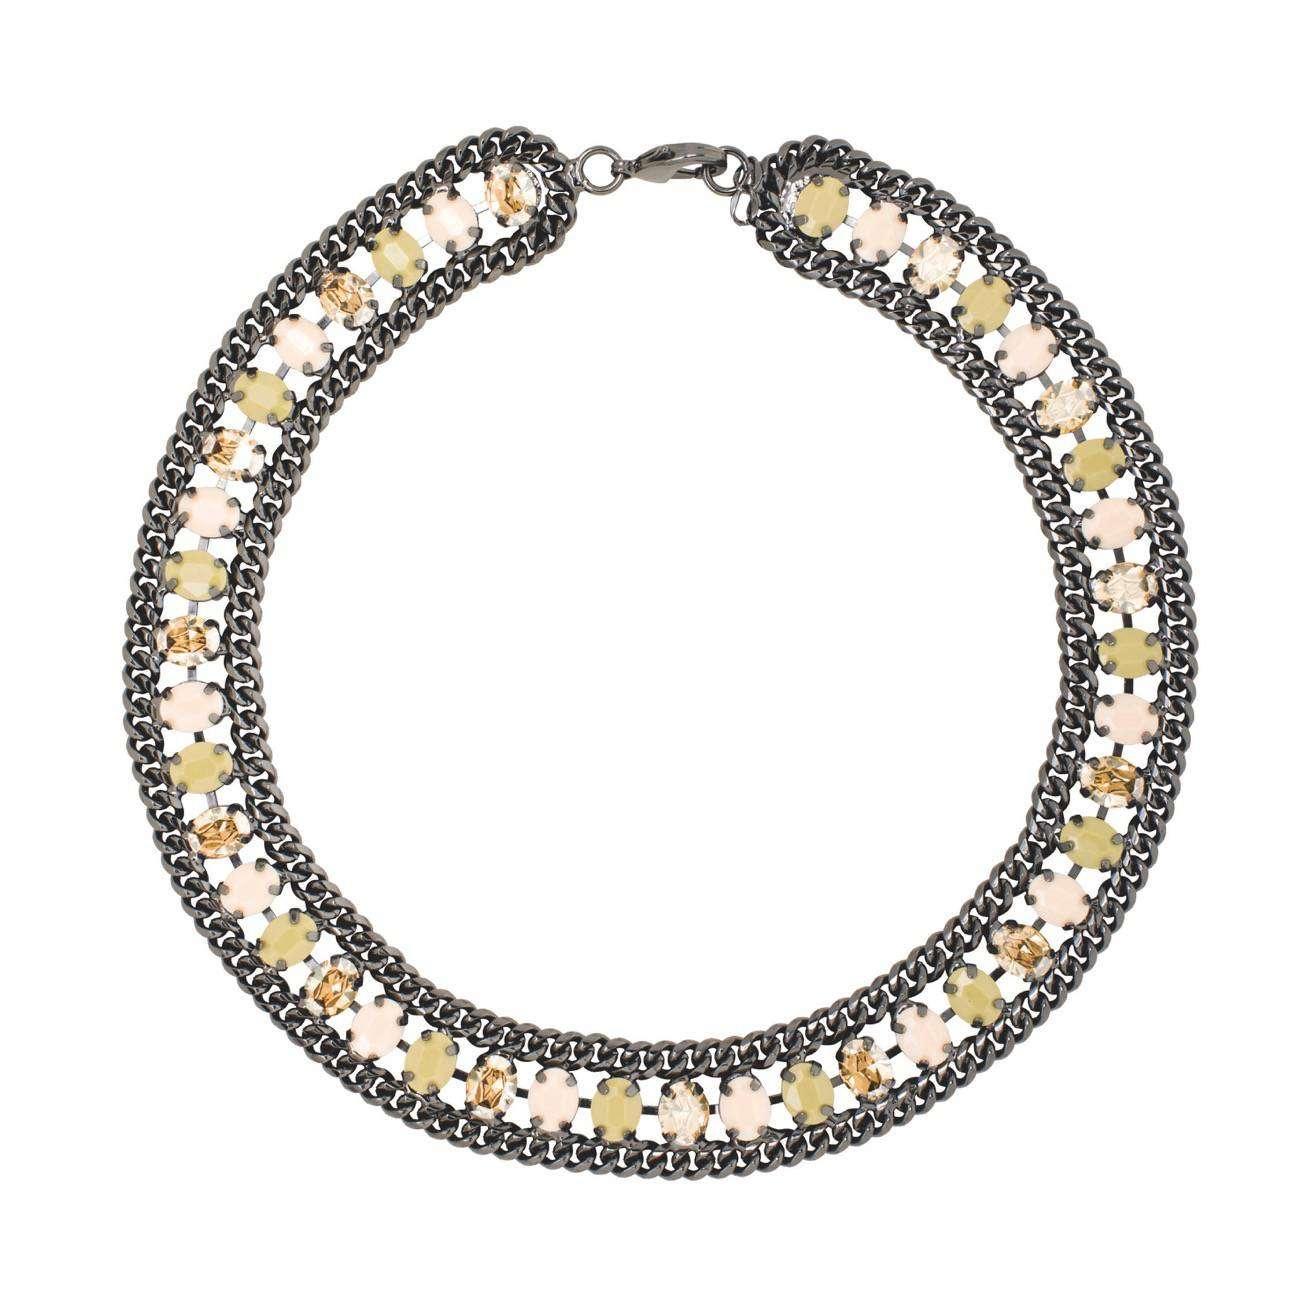 PIPPAJEAN Collar Almond Blossom PVP99euros